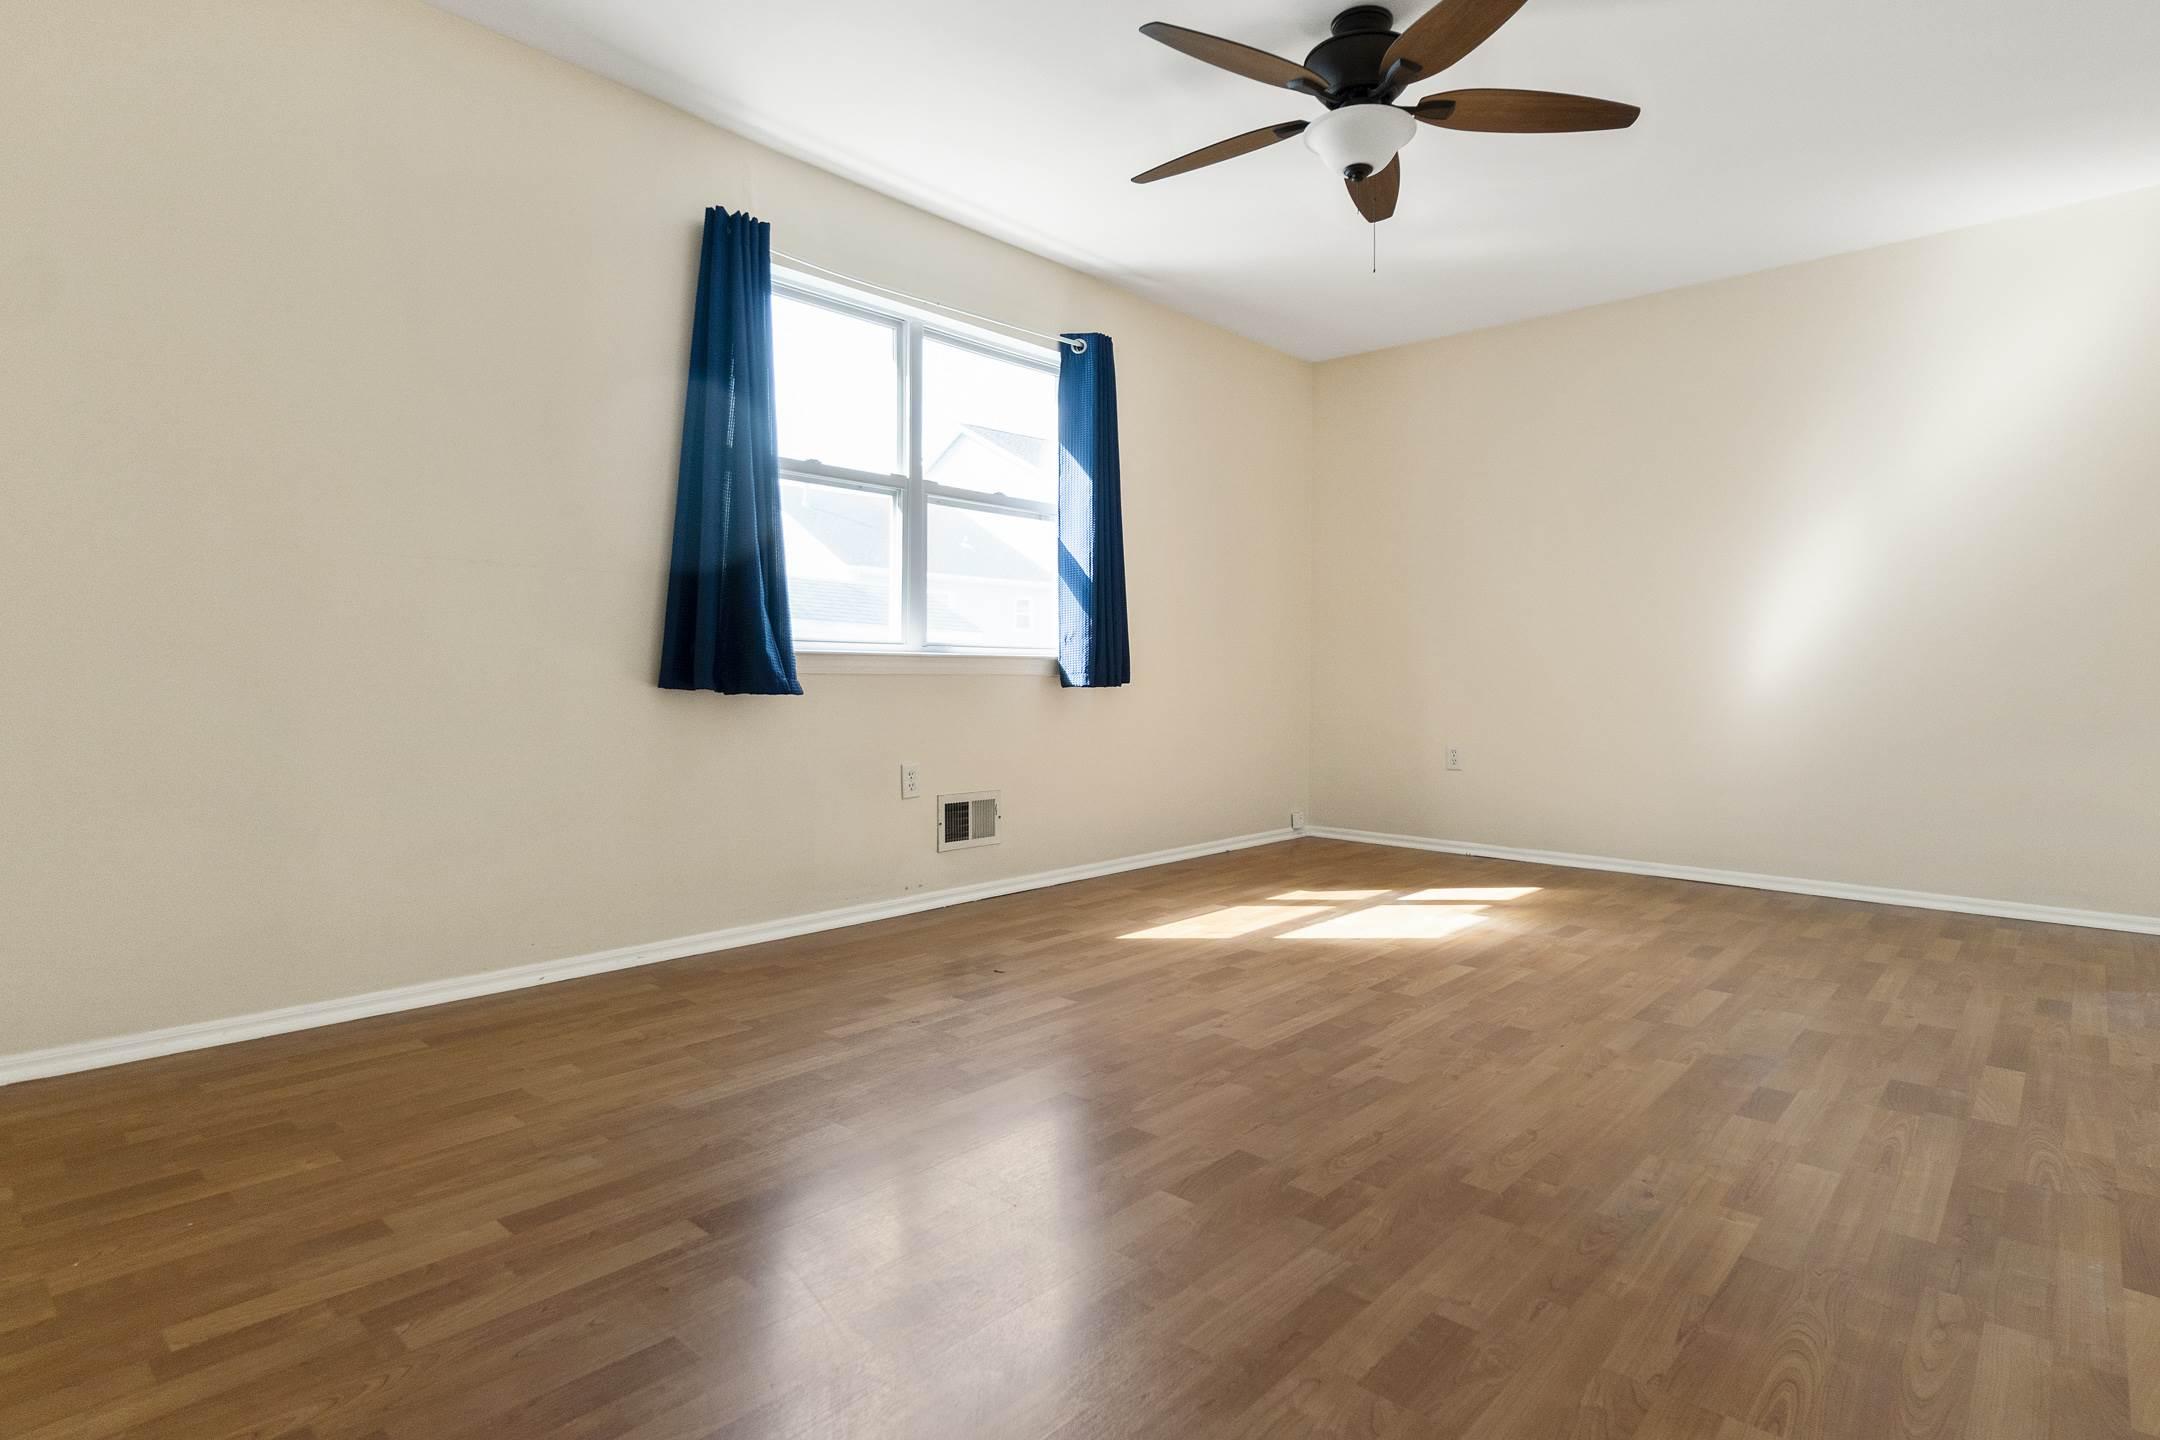 59 Deborah Lane, Howell, NJ 07731